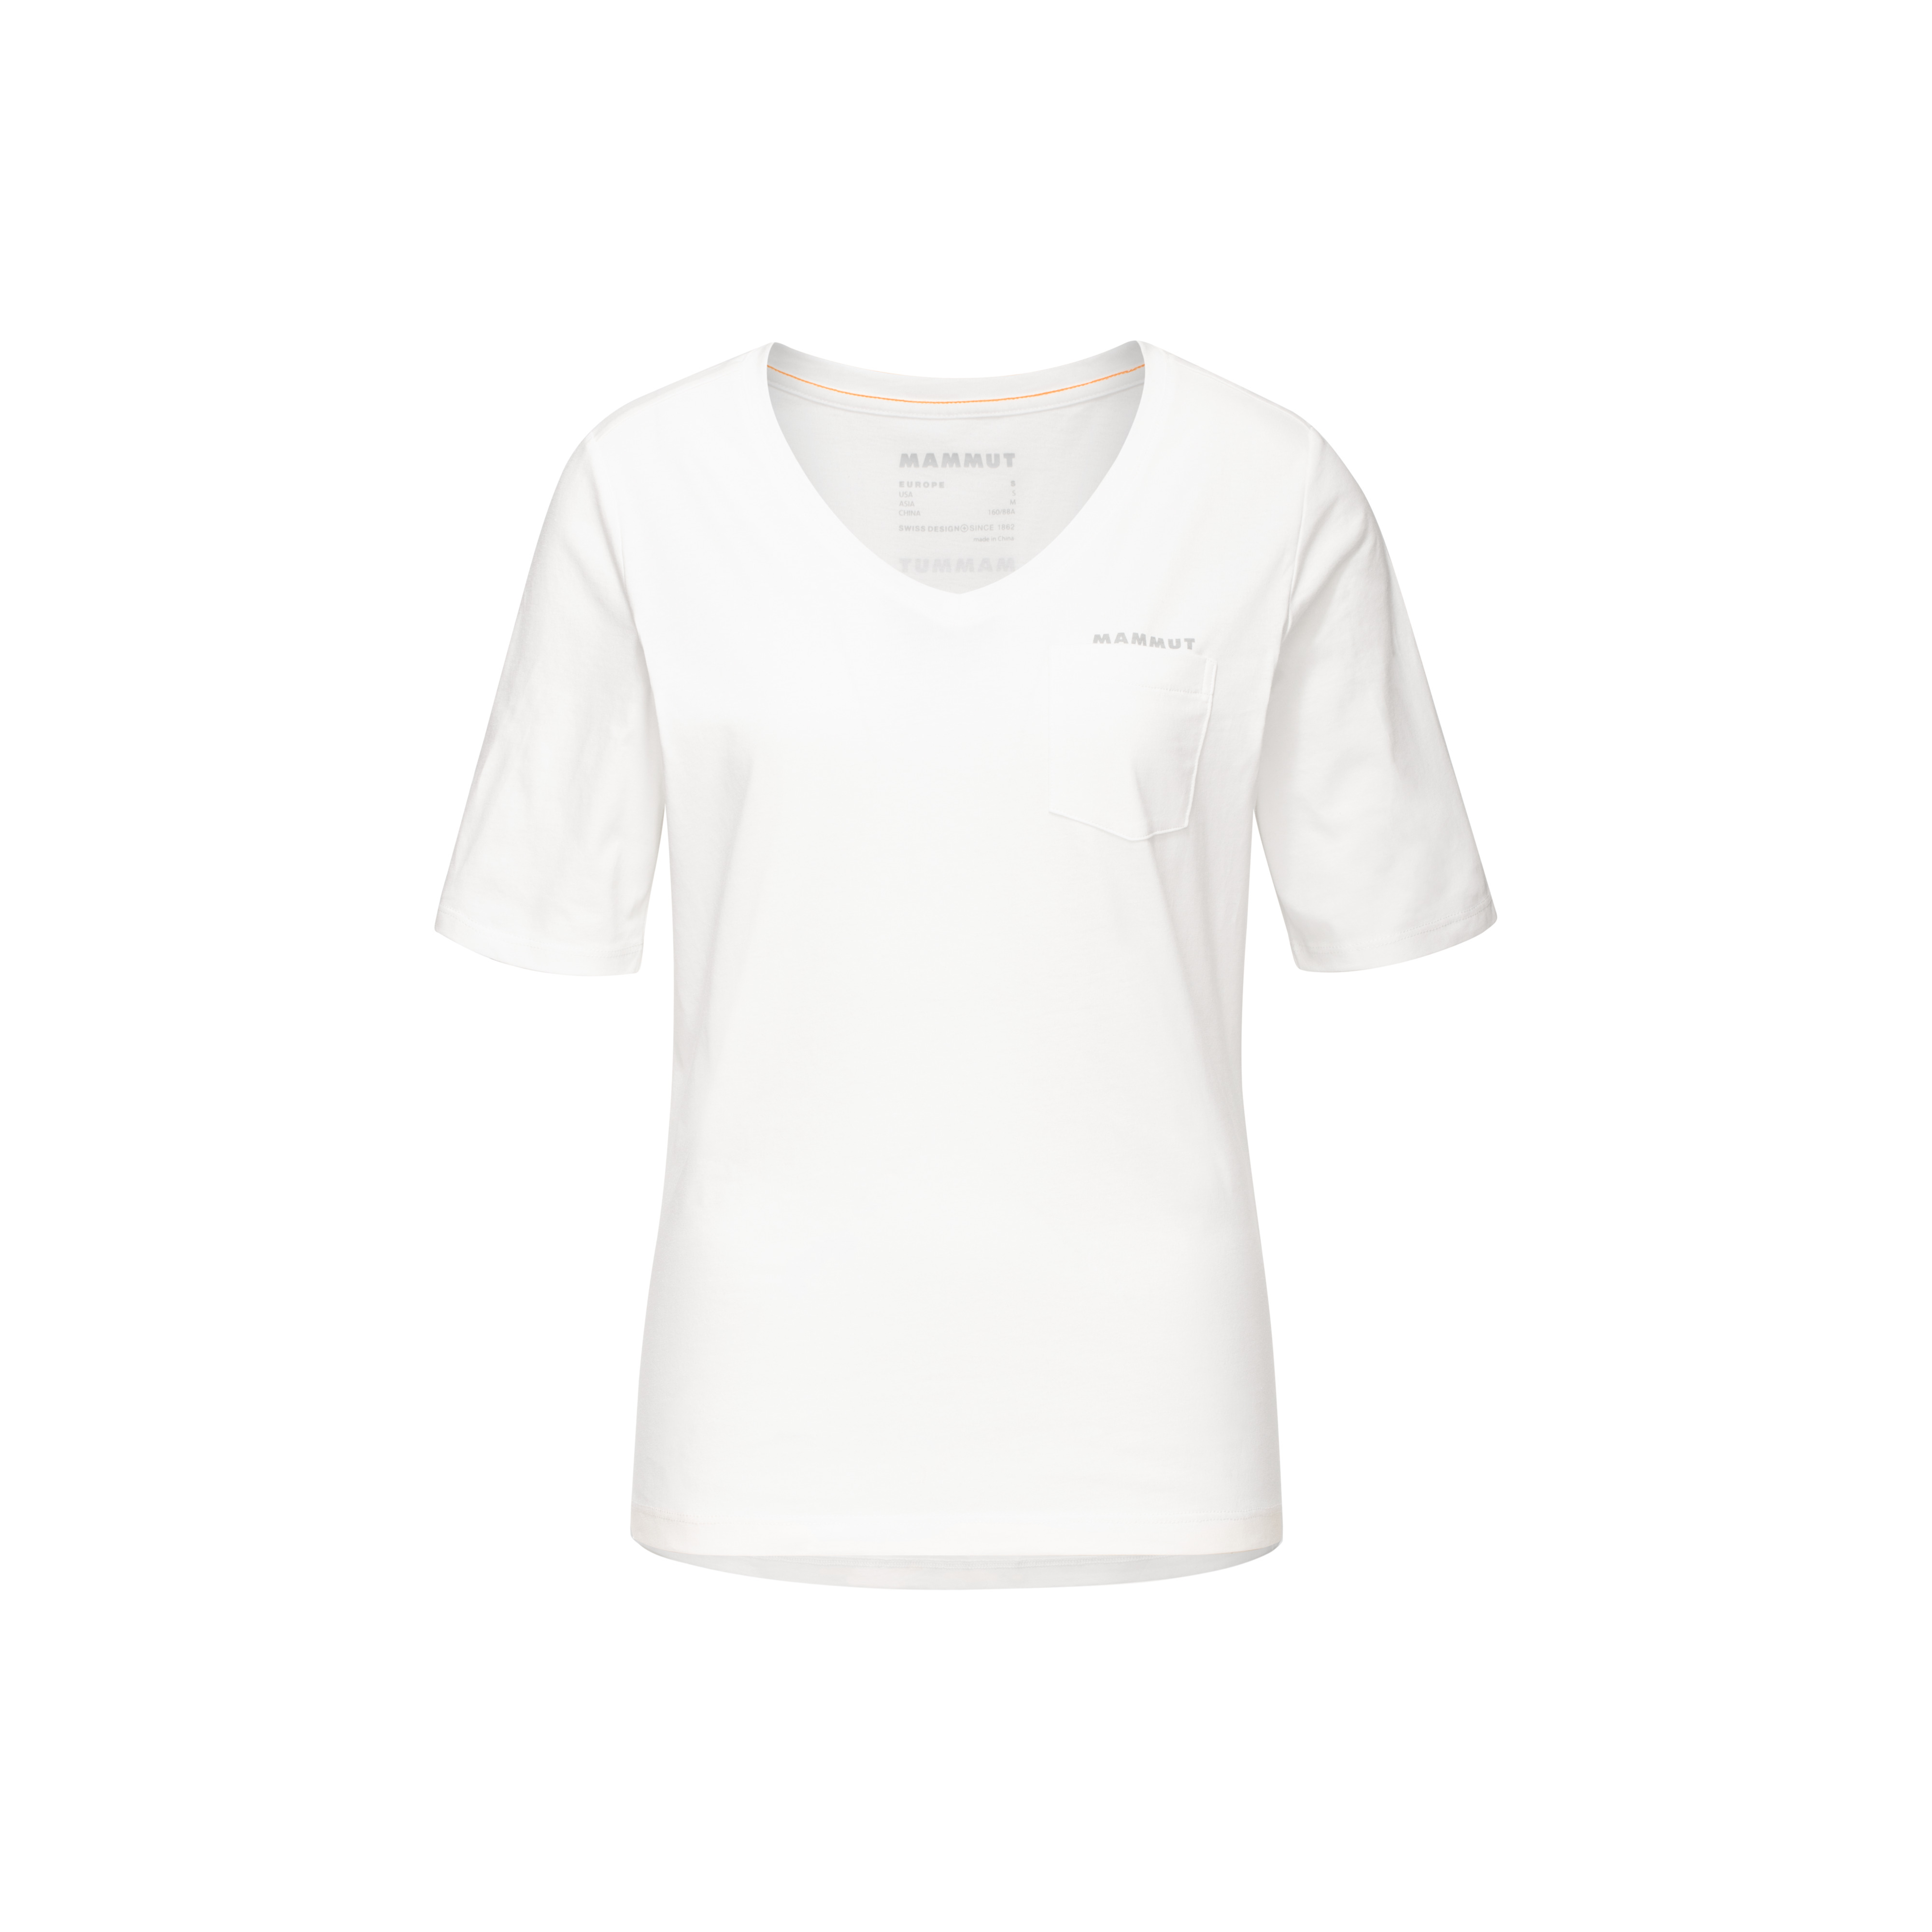 Mammut Pocket T-Shirt Women - white, XS thumbnail